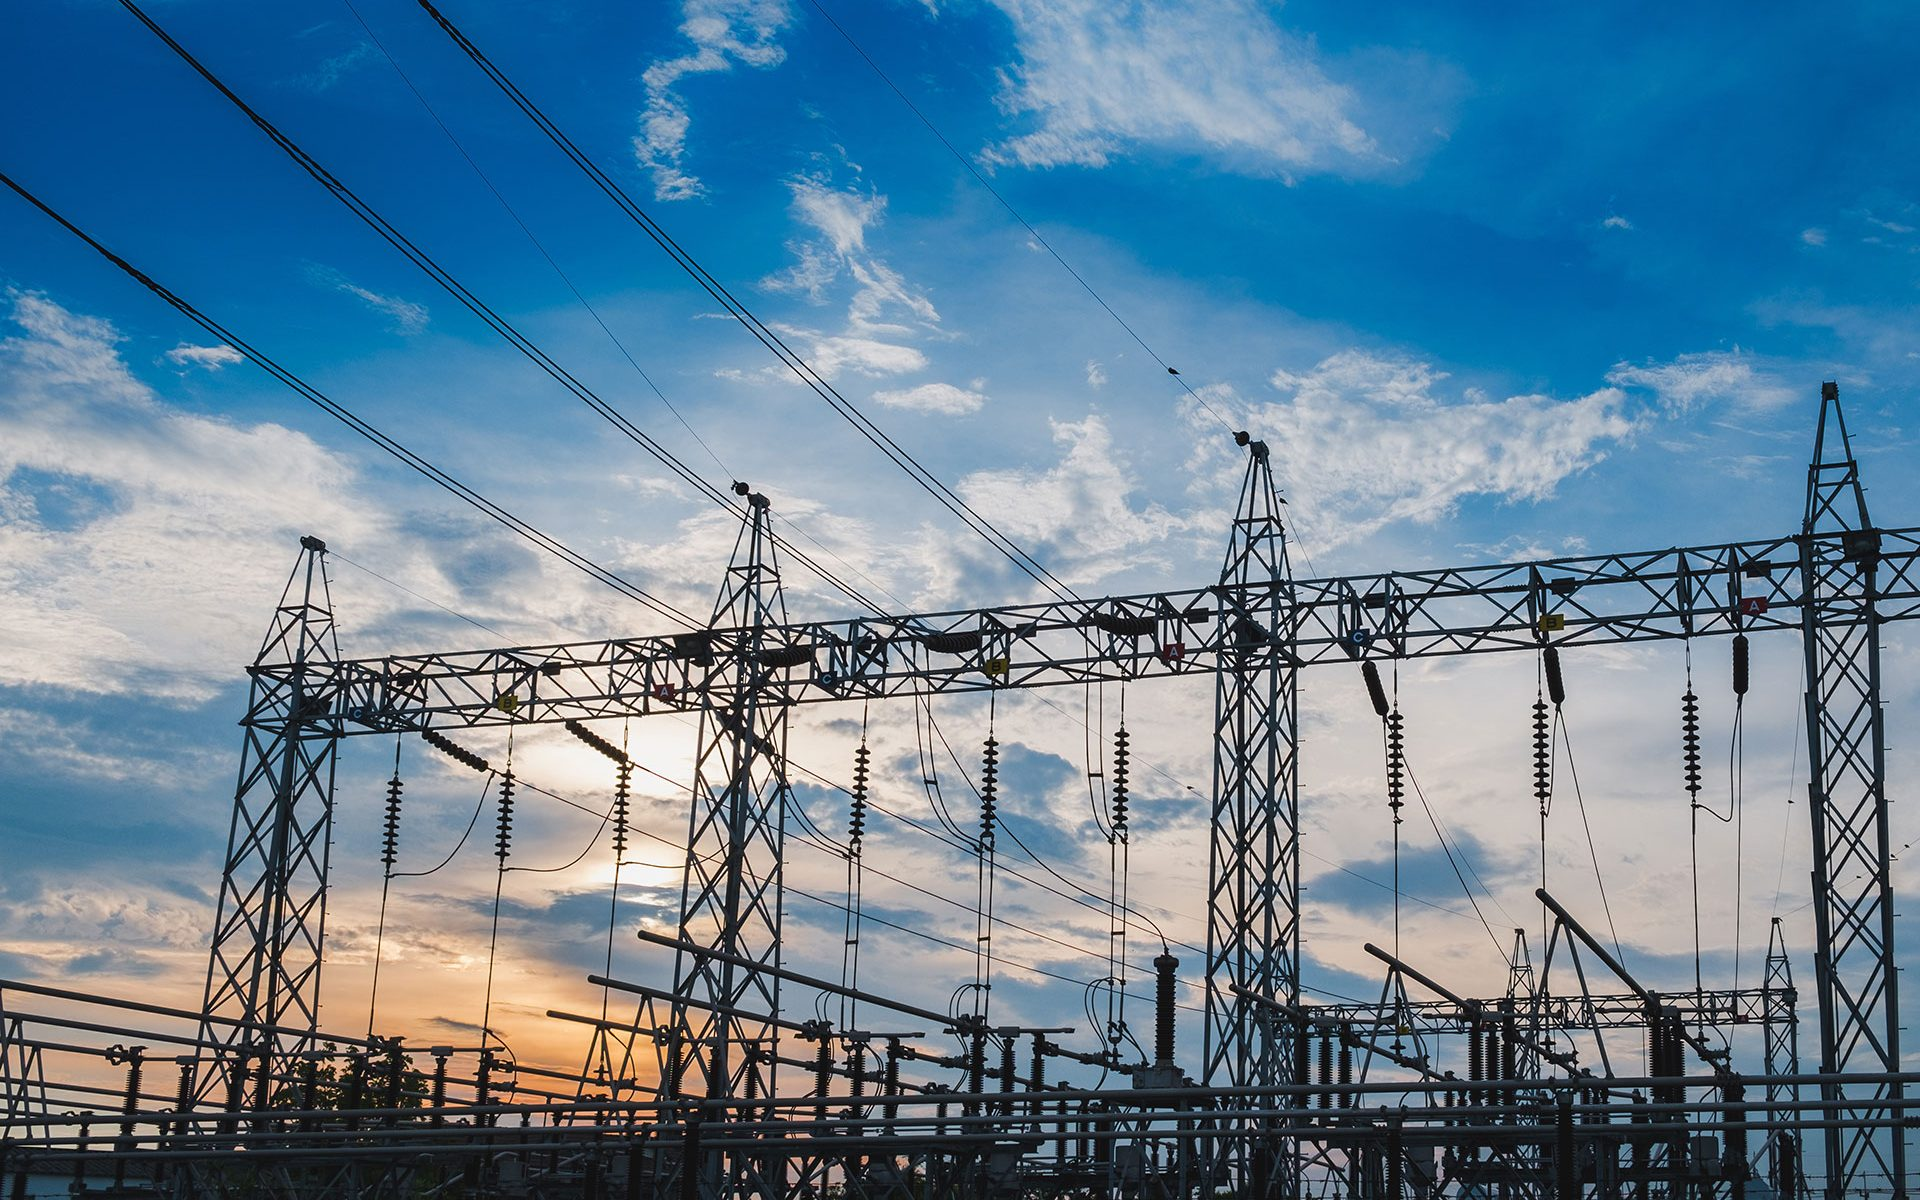 public utilities power lines